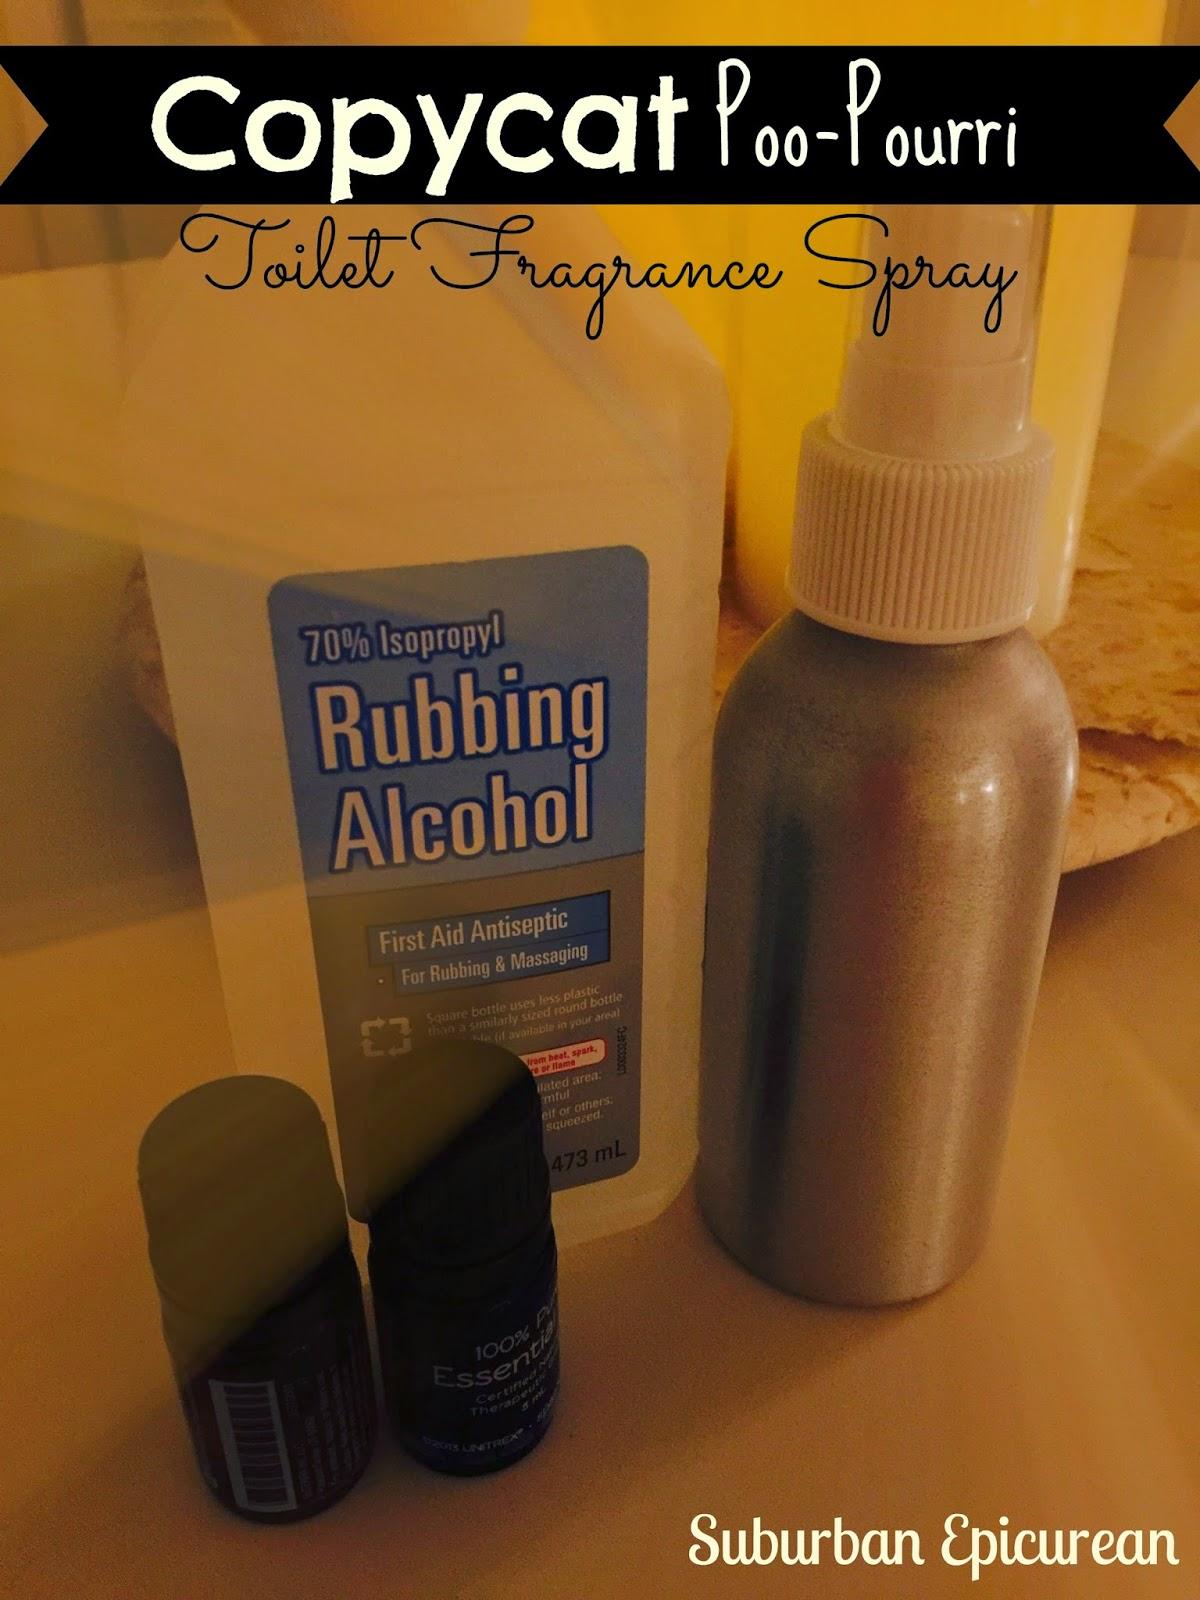 Suburban Epicurean Copycat Poo Pourri Toilet Fragrance Spray Made From Essential Oils